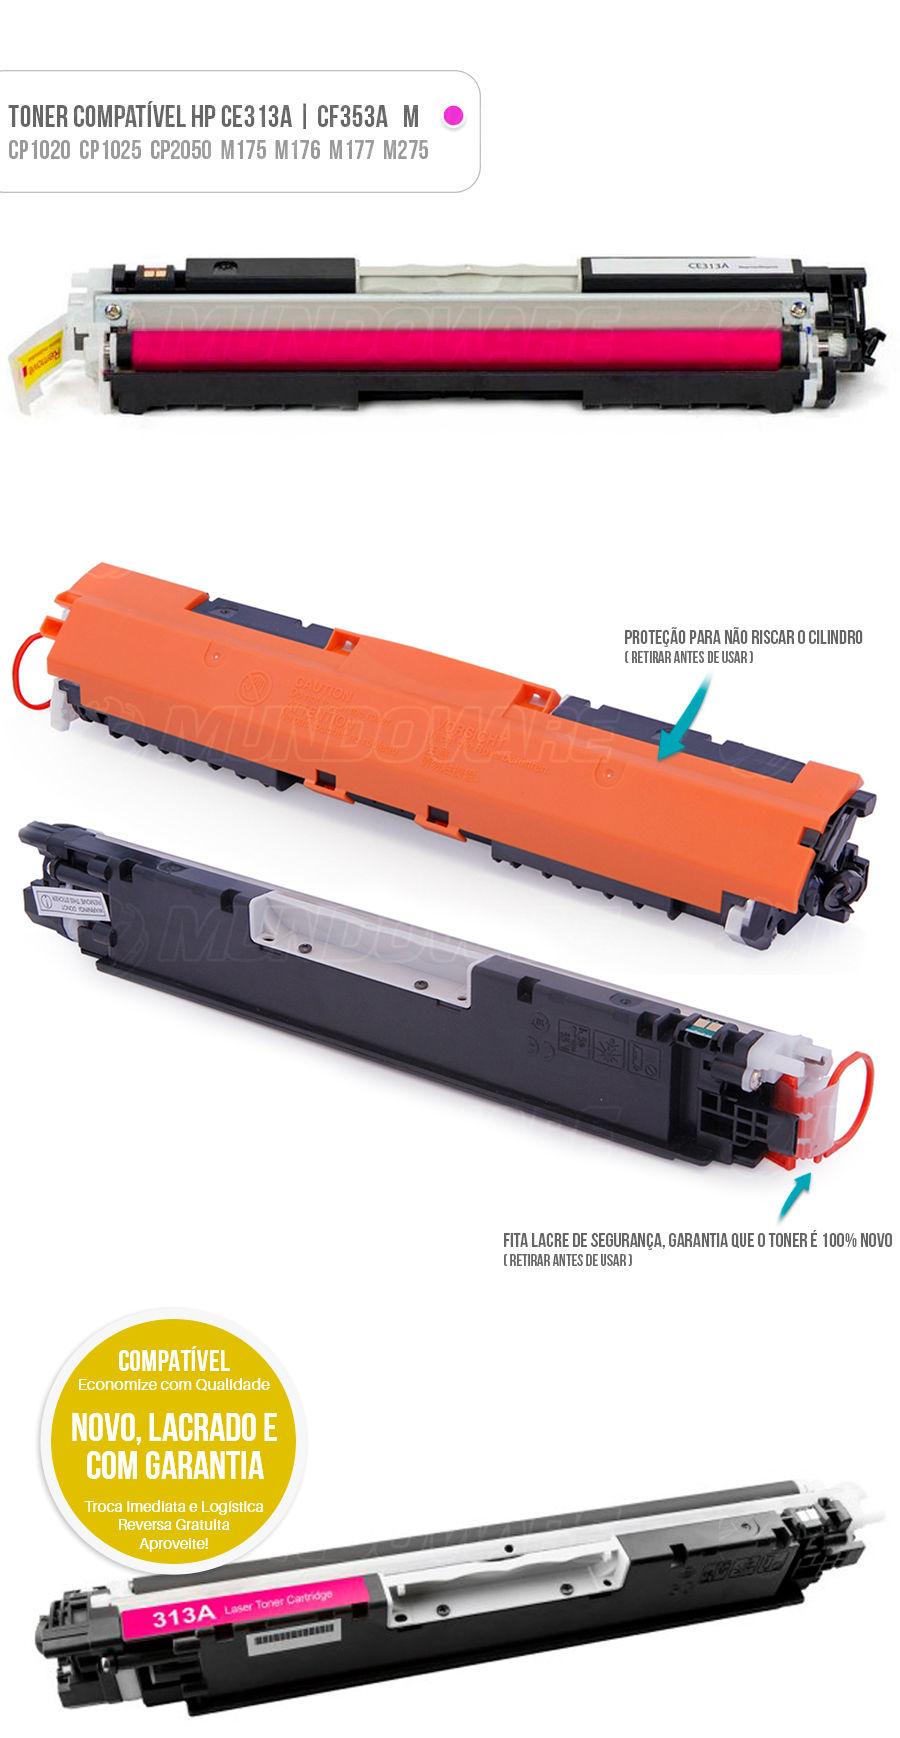 CP1020 CP1020WN CP1025 CP1025NW PRO100 M175 M175A M175NW M275 M275NW M176 M176N M177 M177FW Tonner Color HP Magenta